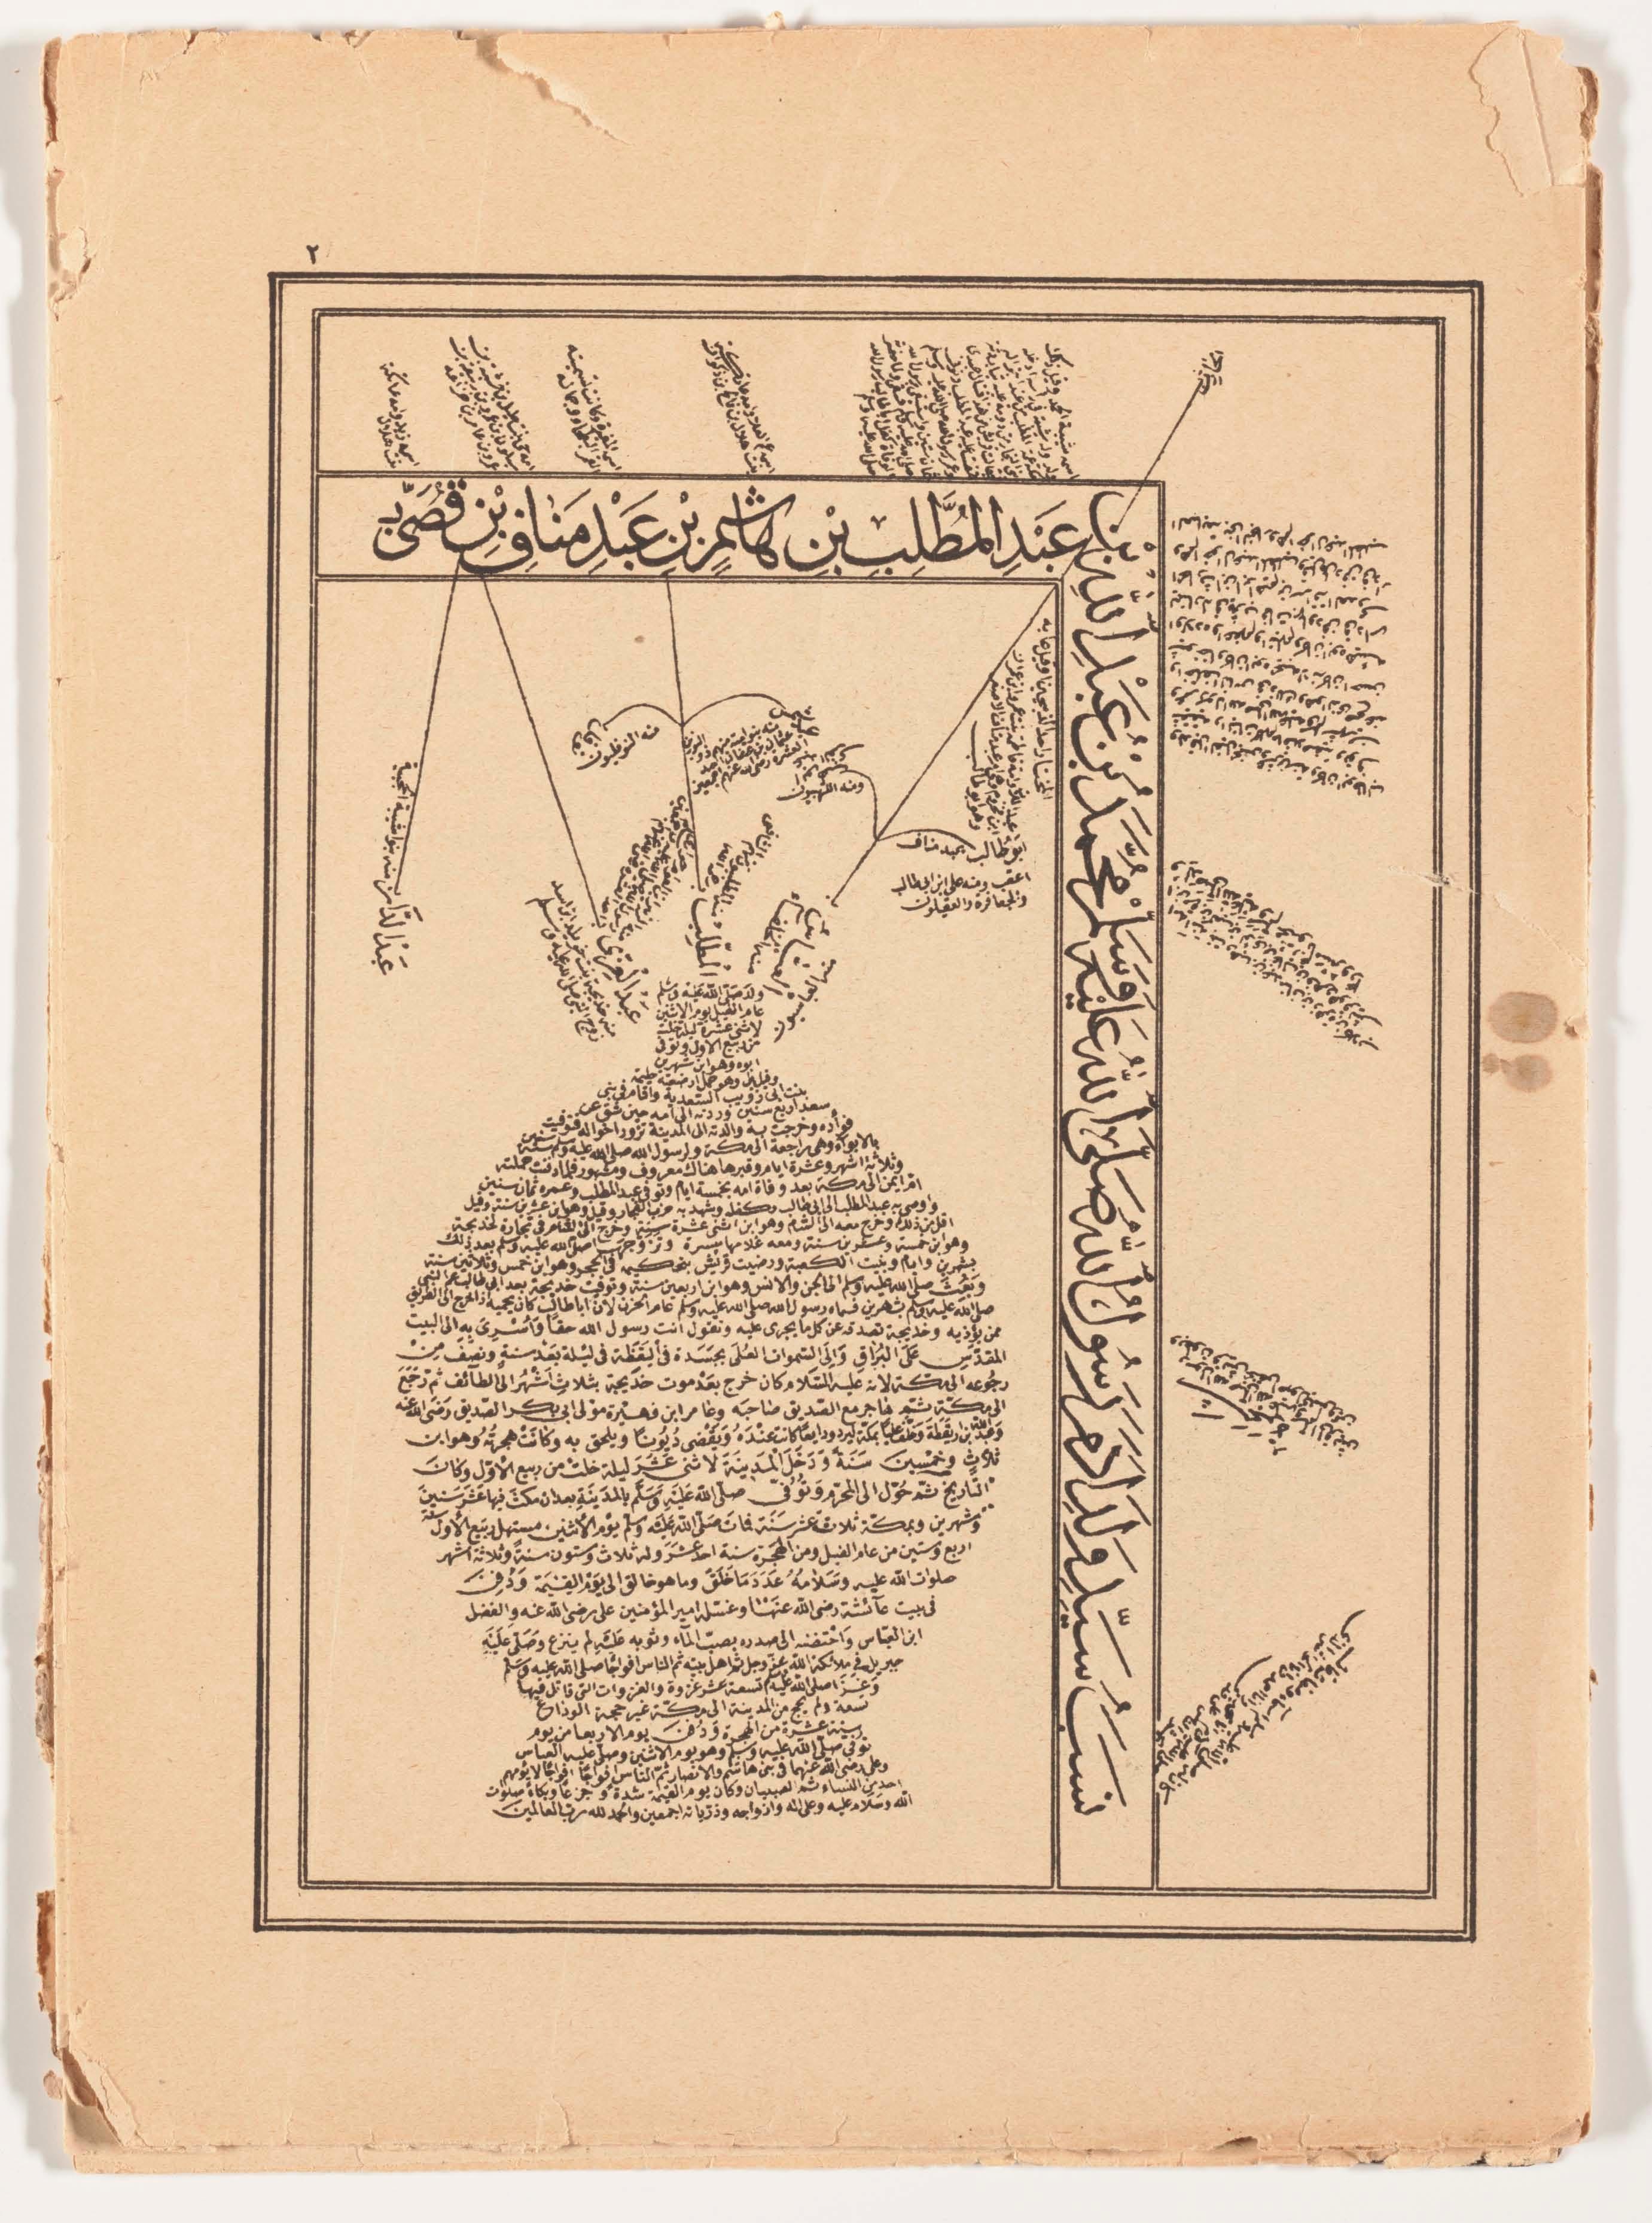 Jawwānī, Muḥammad ibn Asʻad, 1131-1192. al-Shajarah al-Muḥammadīyah.[Istanbul?] : Maṭbaʻat Muḥammad wa-Burhān al-Dīn, 1331 [1913].